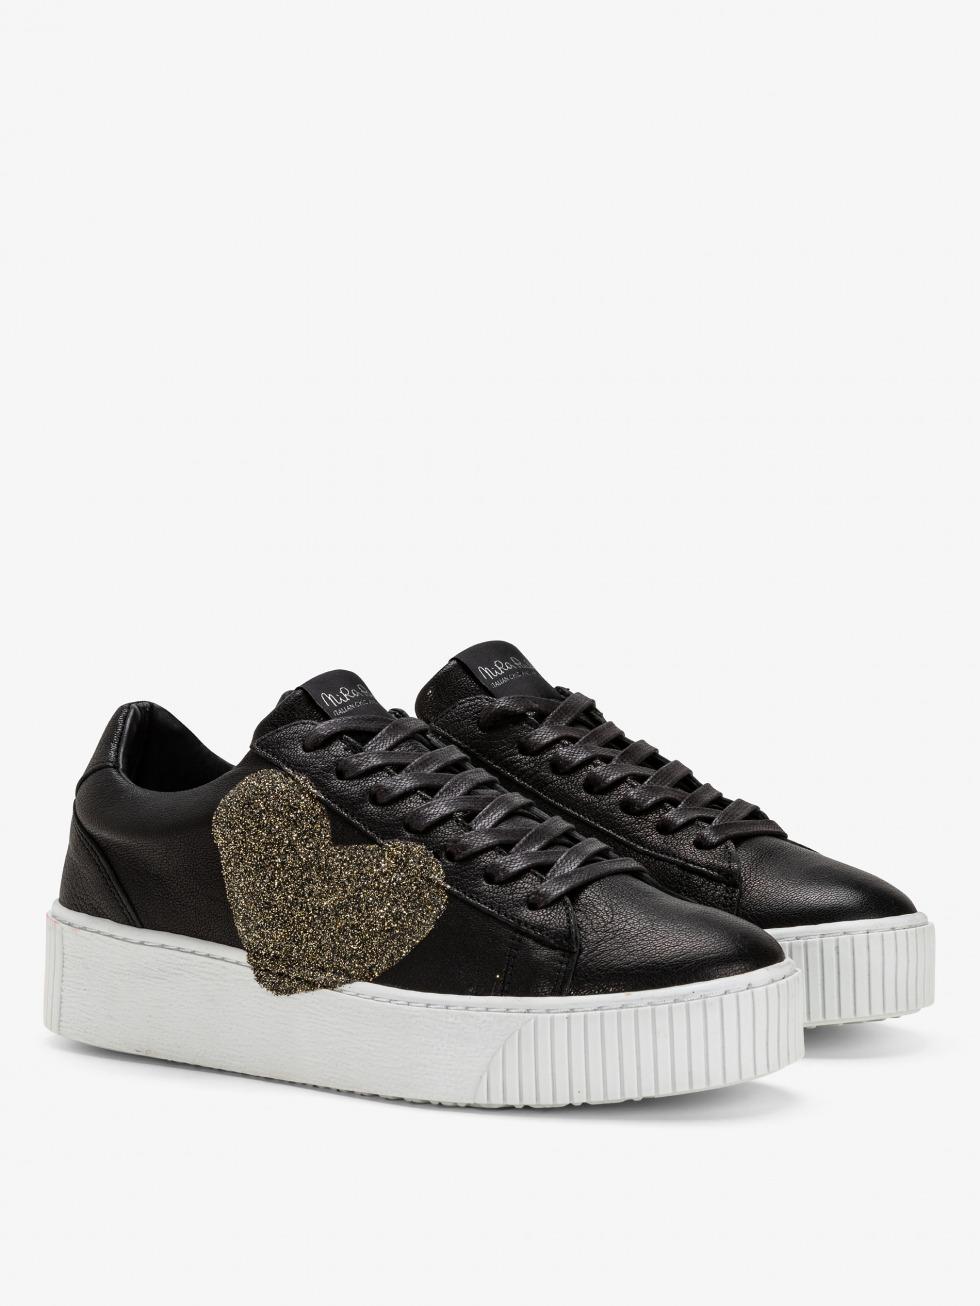 Sneakers Cosmopolitan Meteorite Glitter - Cuore